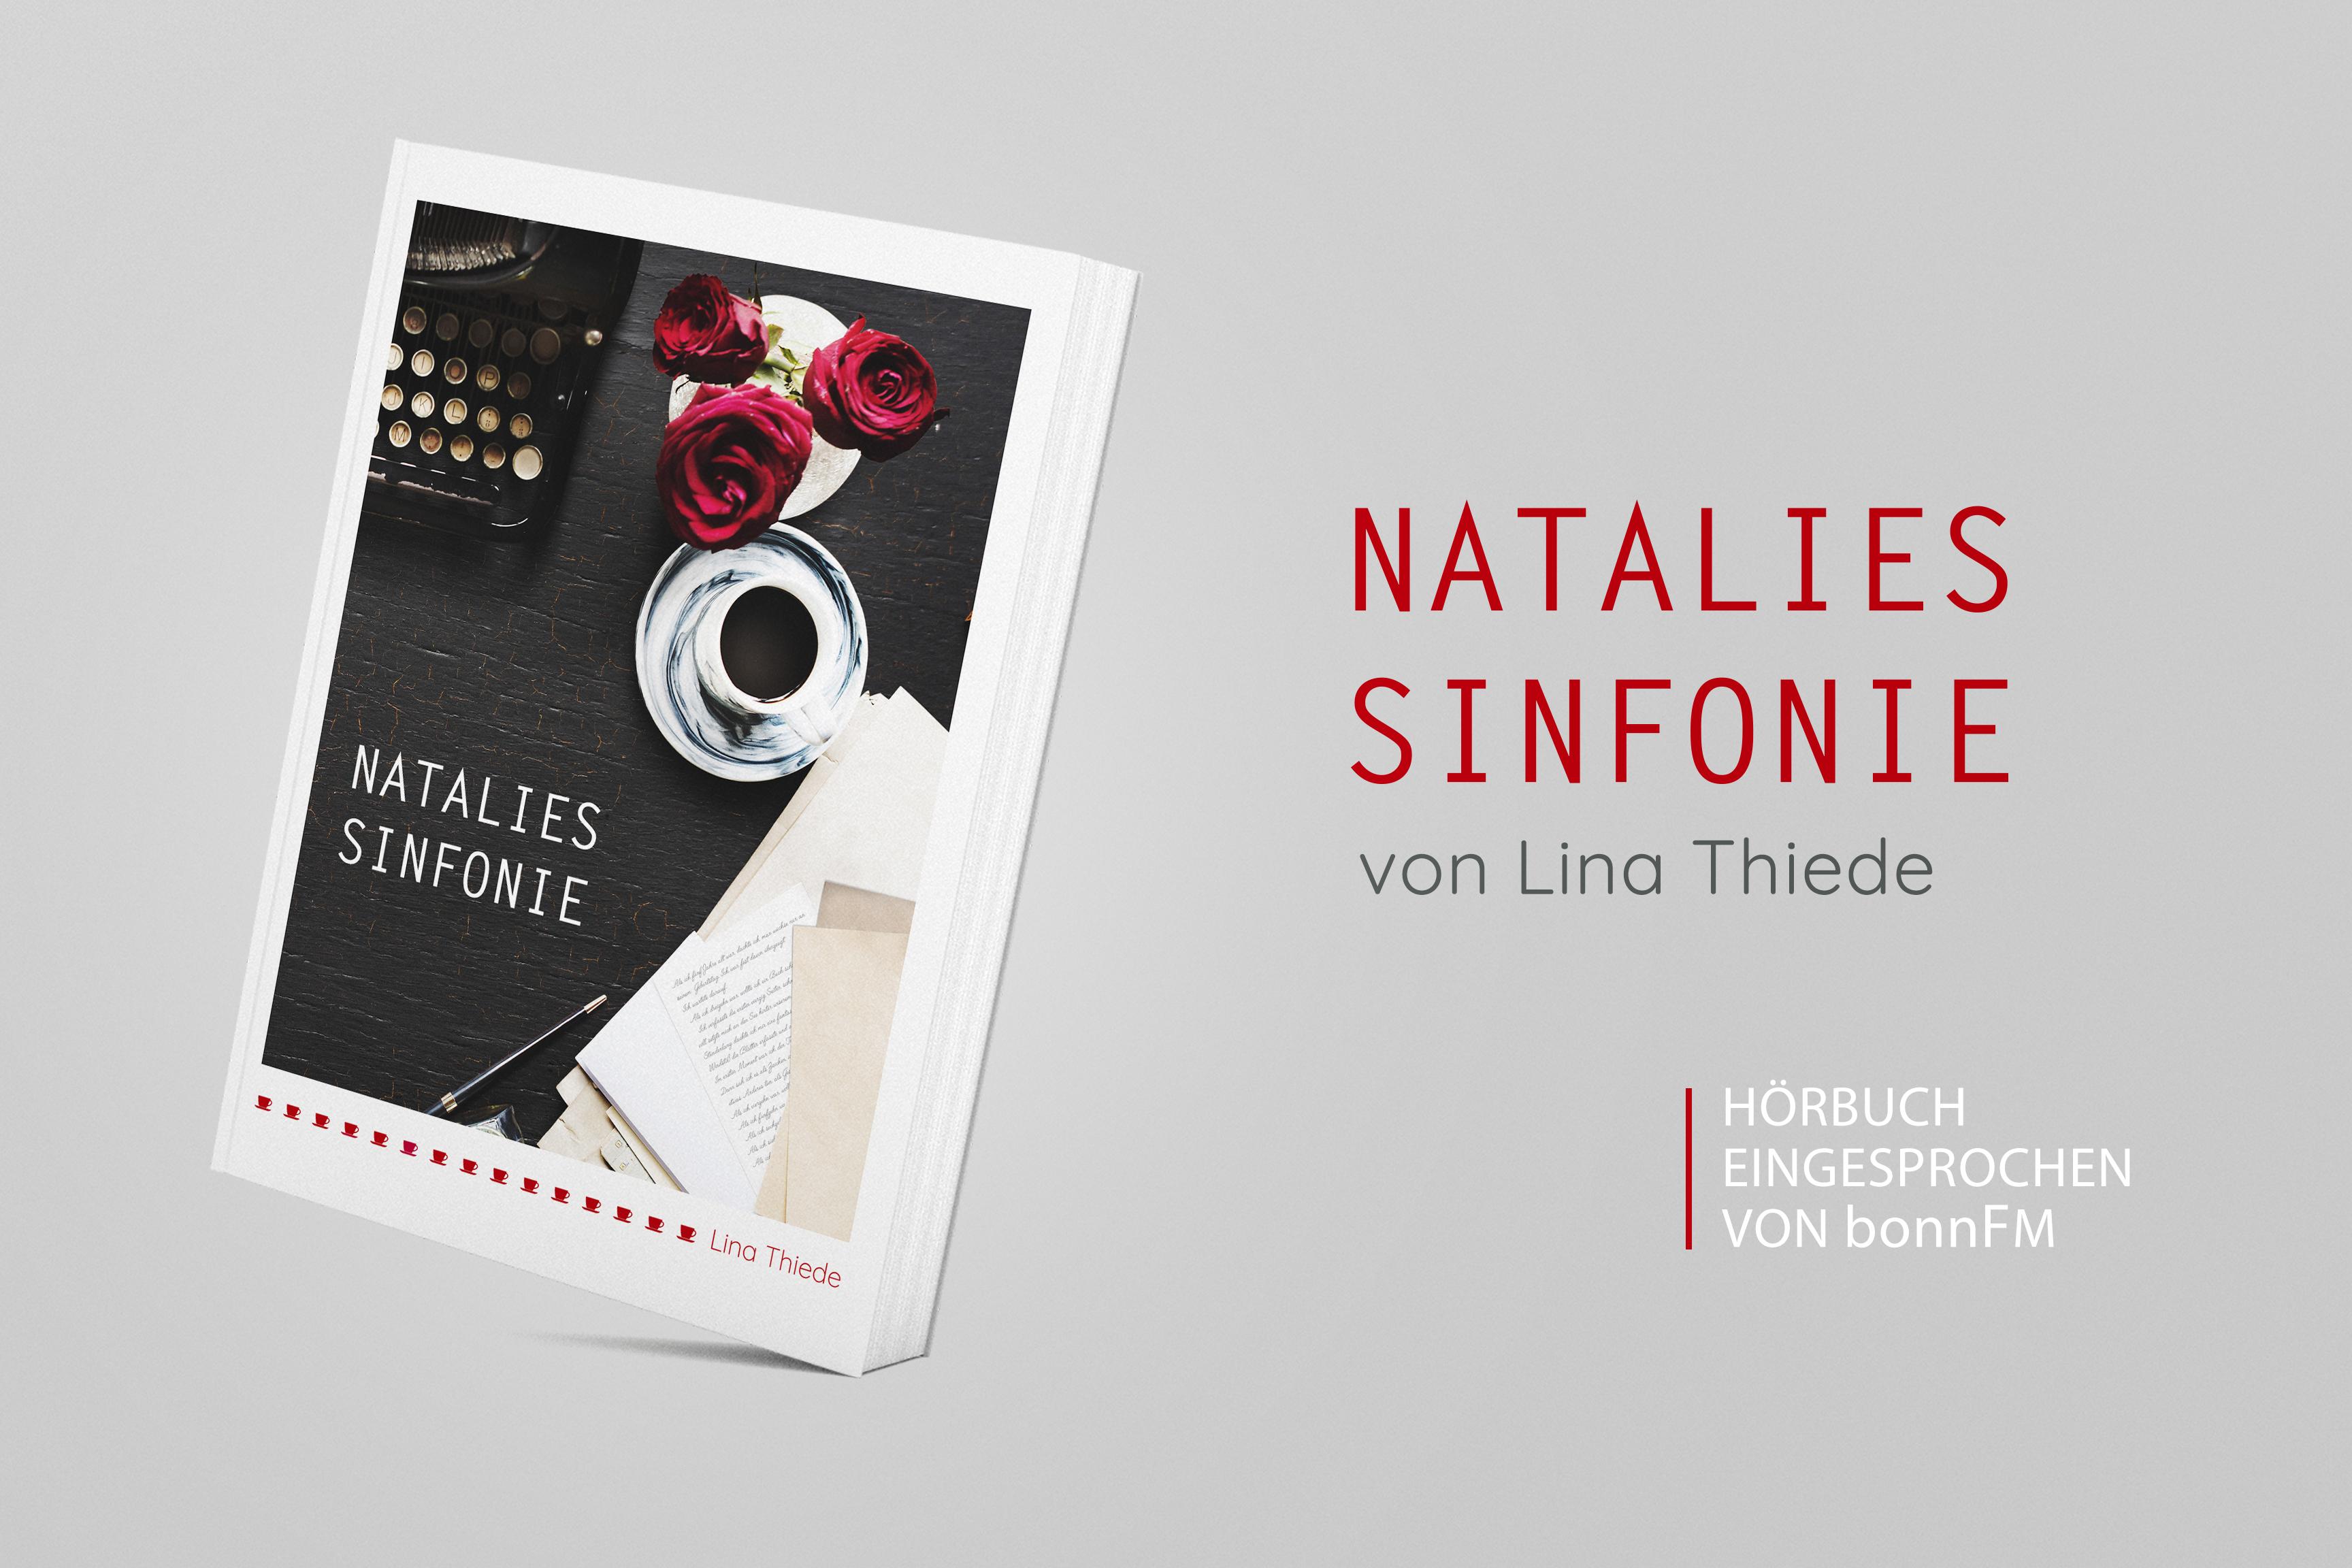 Natalies Sinfonie von Lina Thiede – Kapitel 10: Atonal